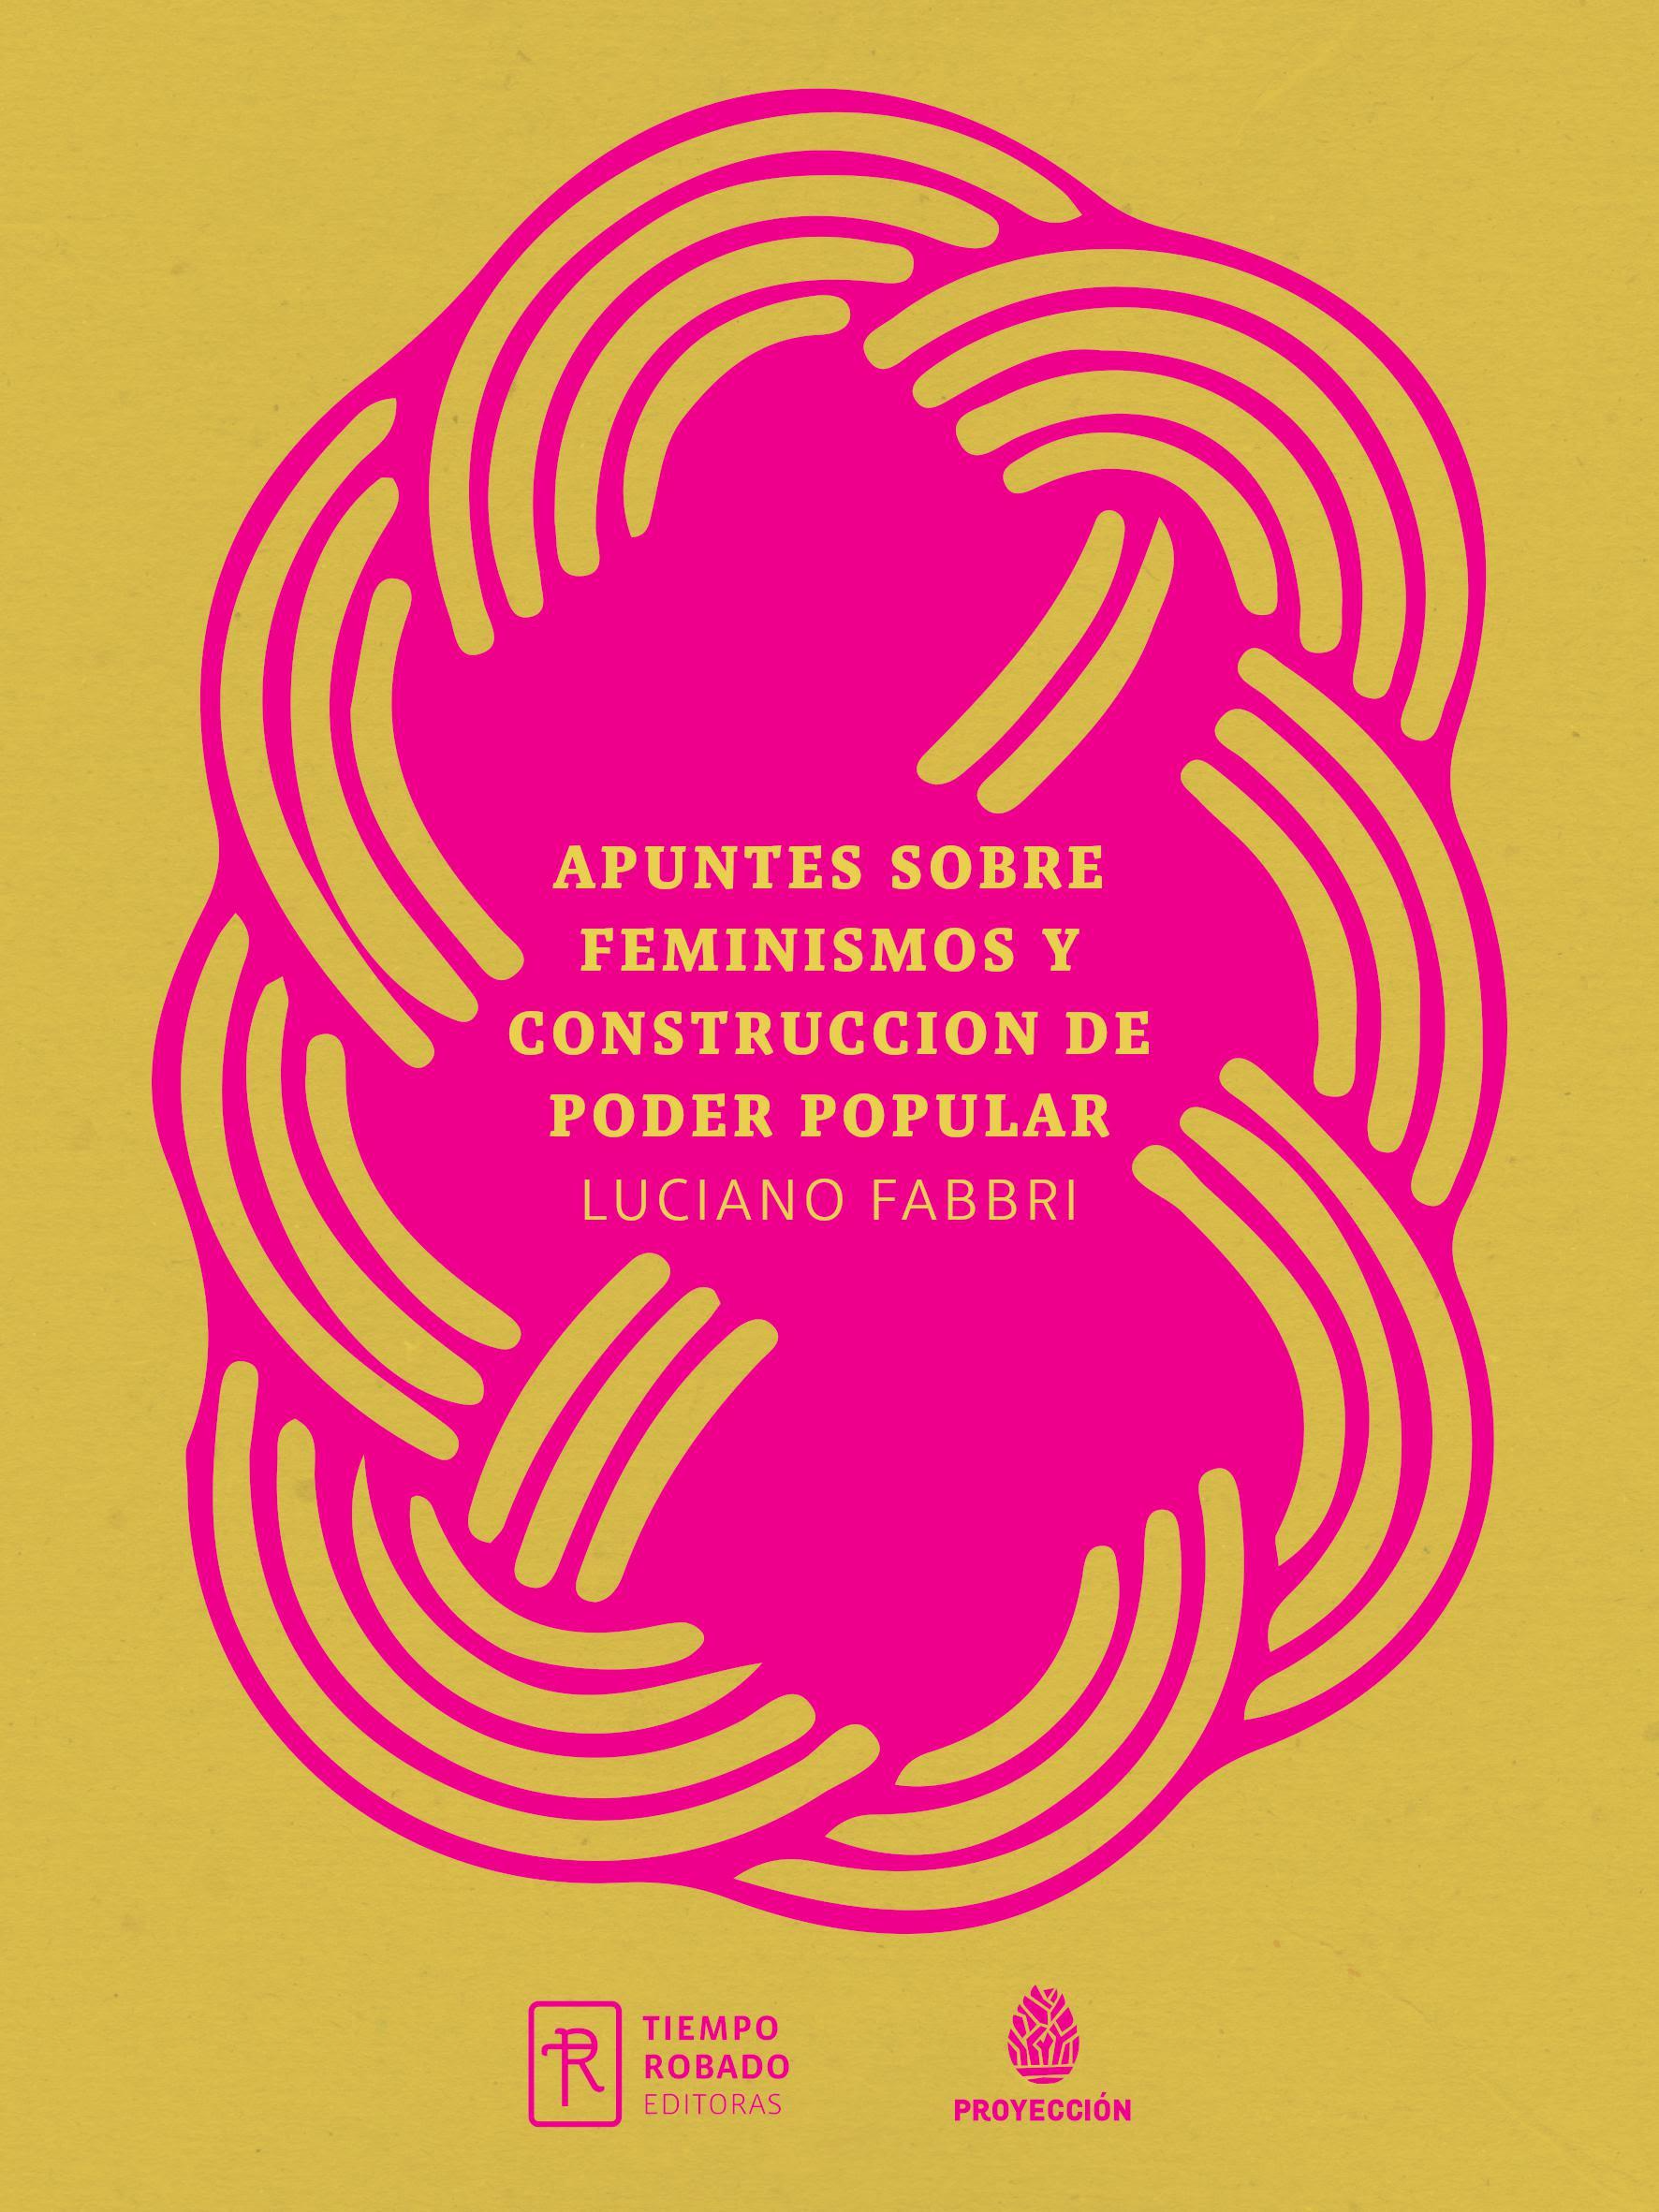 APUNTES SOBRE FEMINISMOS